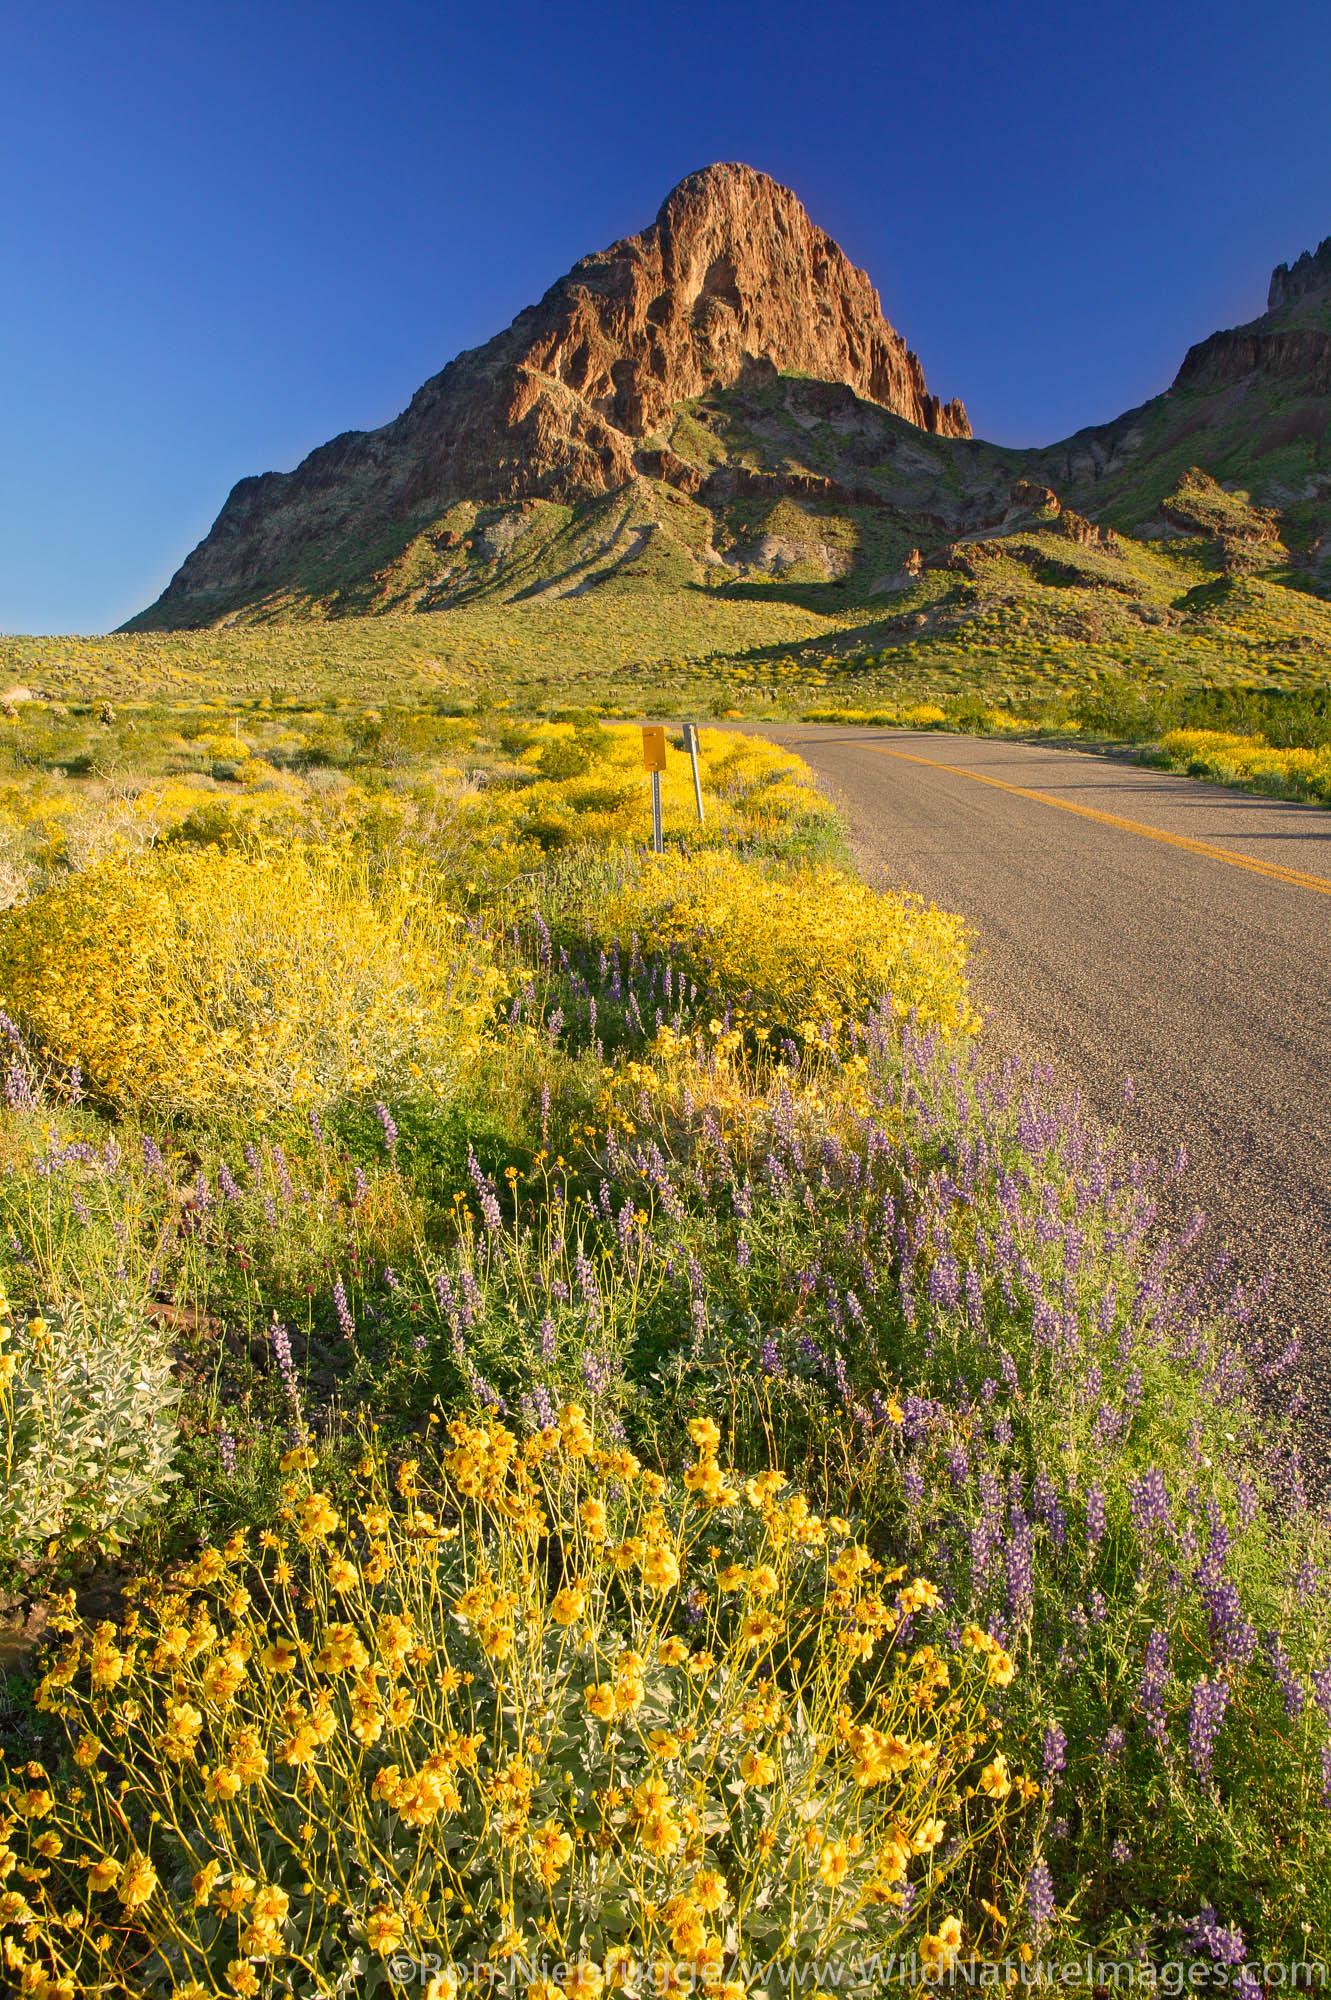 Wildflowers along Route 66, near Oatman, Black Mountains, Arizona.